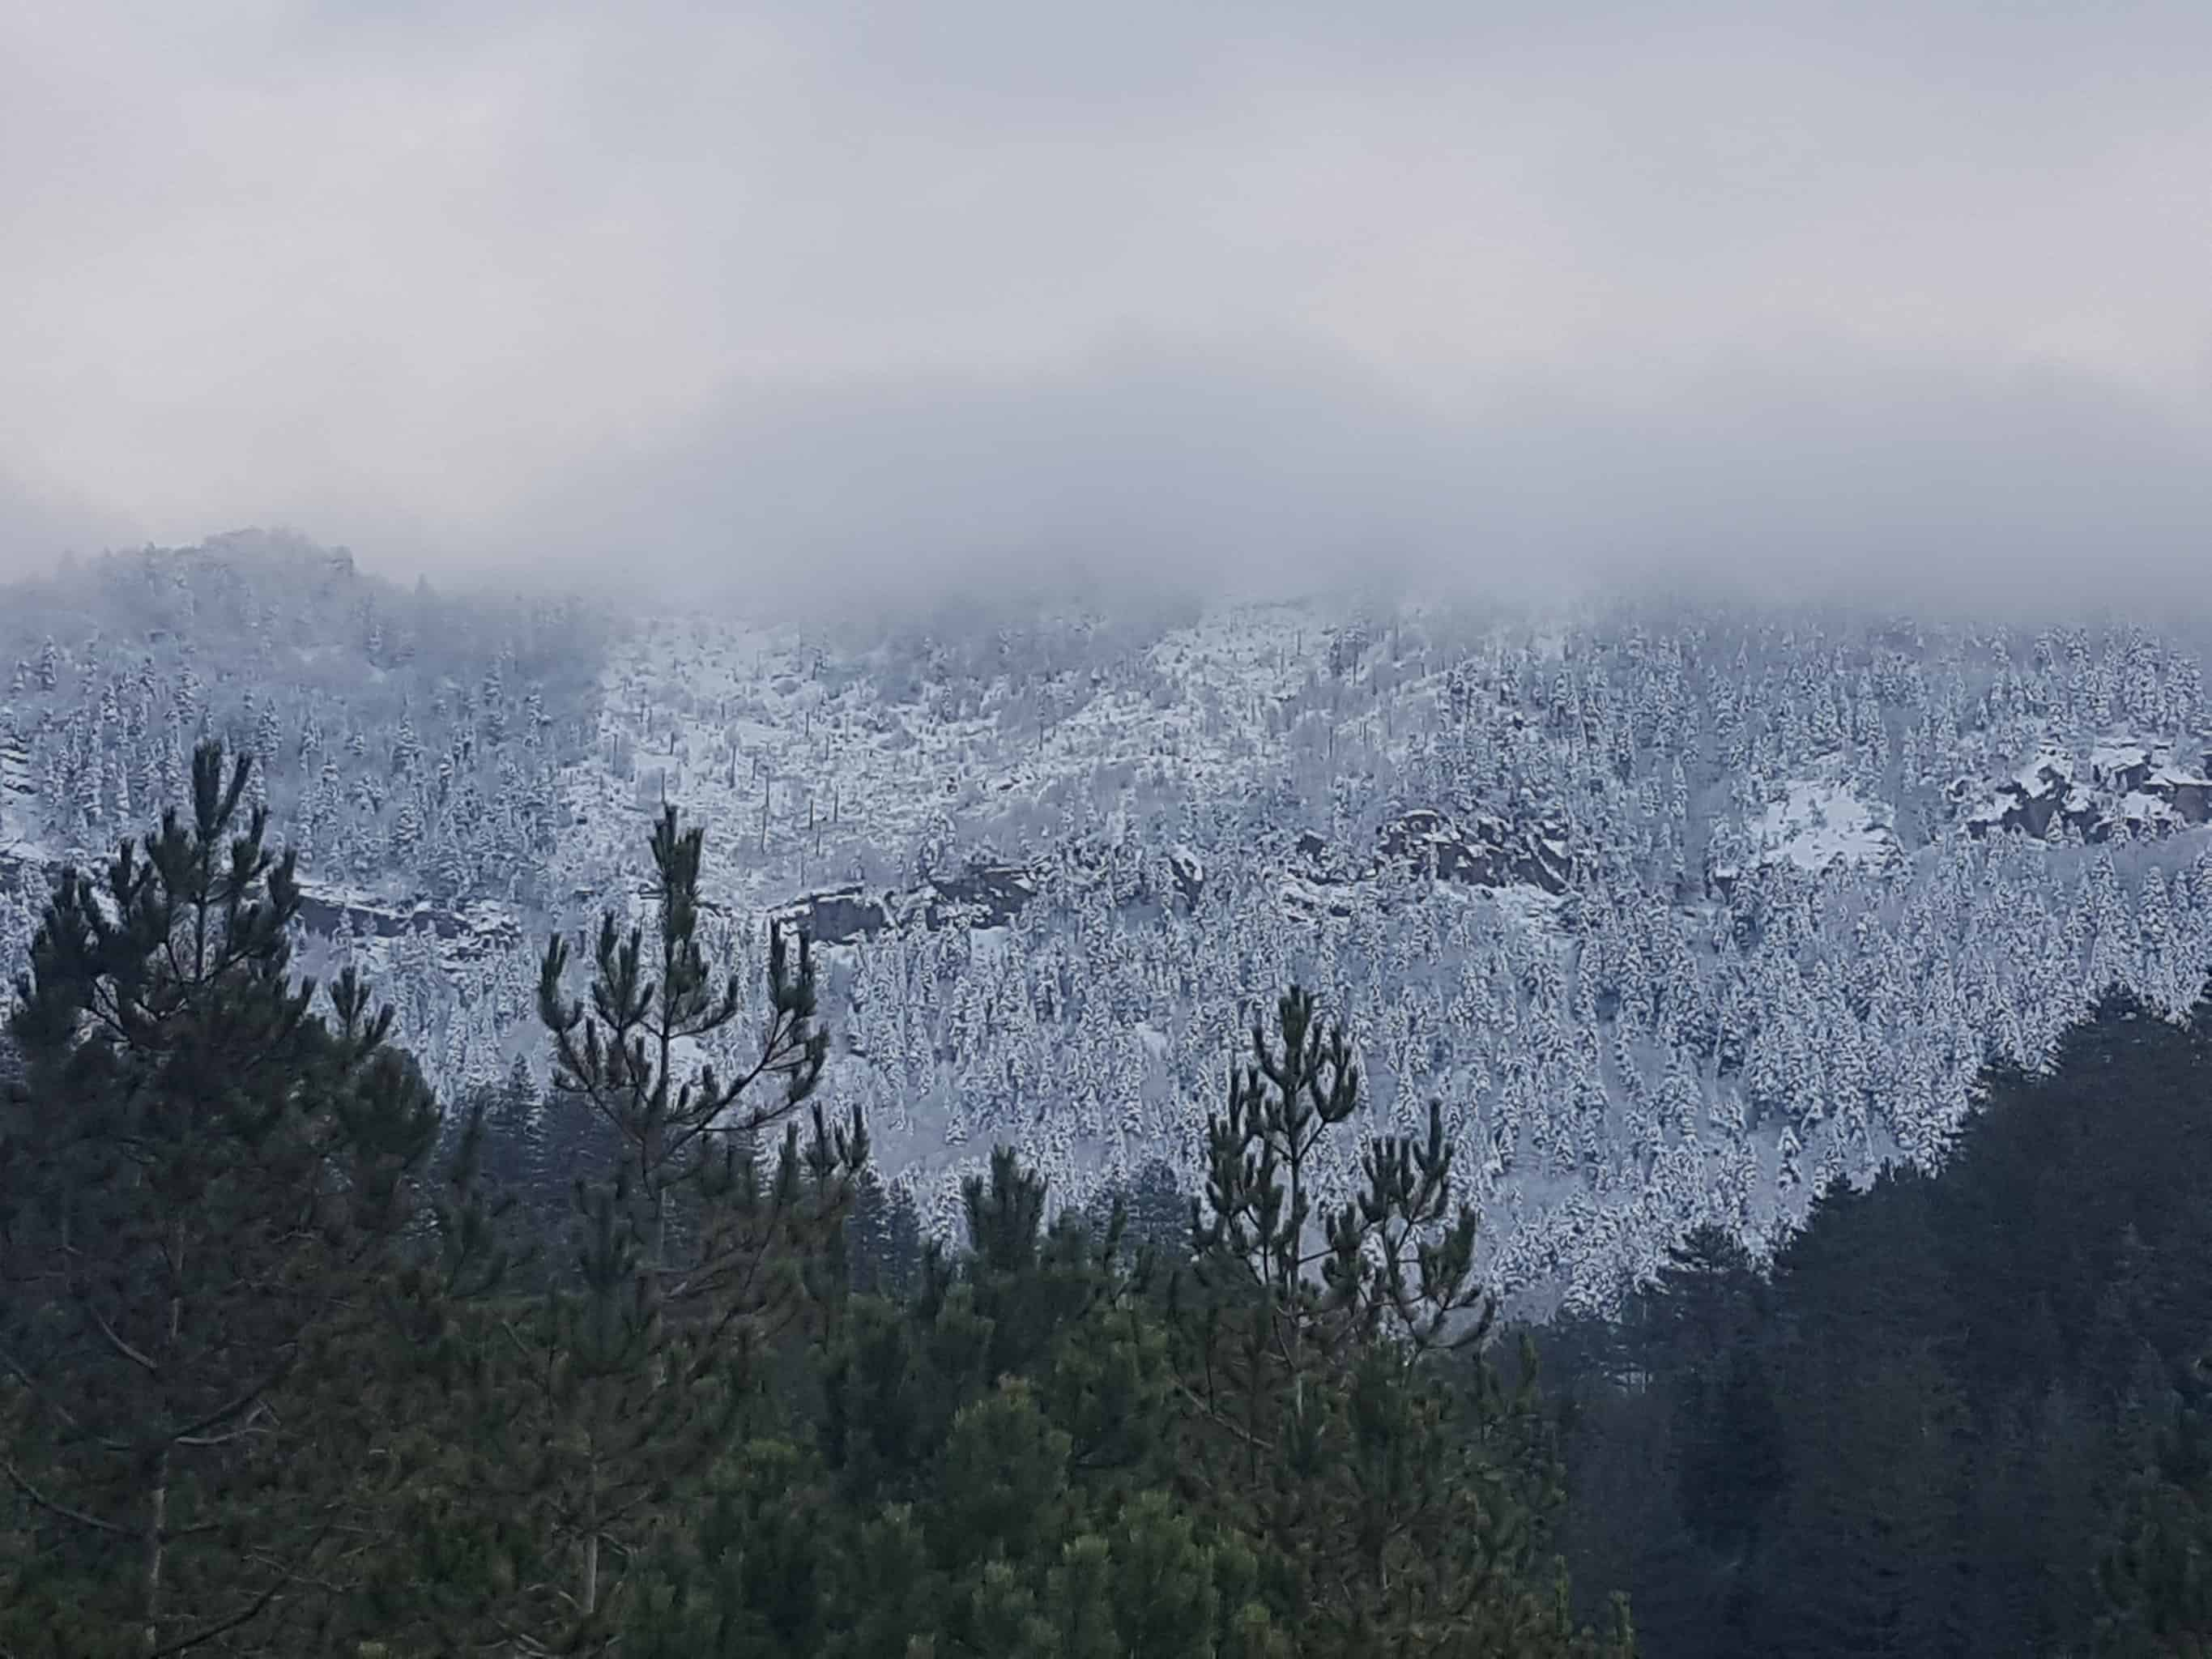 The first snow in Bredhi i Drenovës on 12th December 2019 - photo: Iljon Thanas